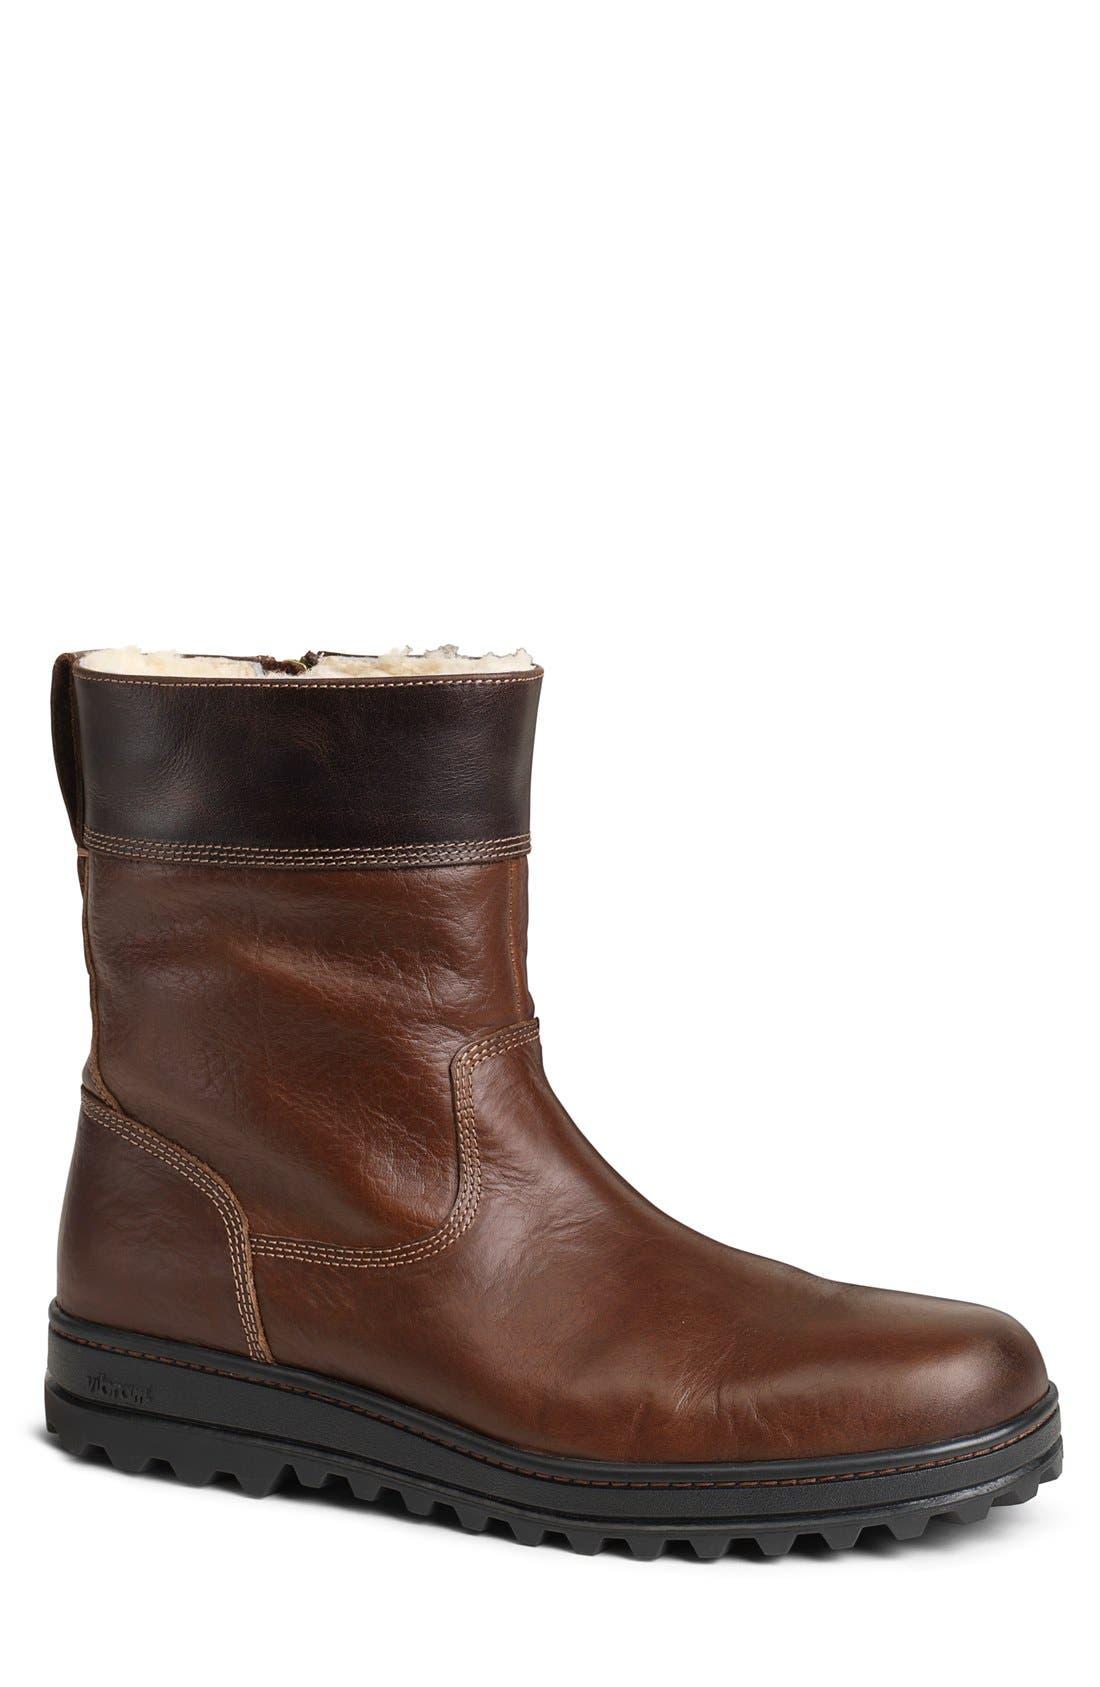 Alternate Image 1 Selected - Trask 'Winslow' Plain Toe Boot (Men)